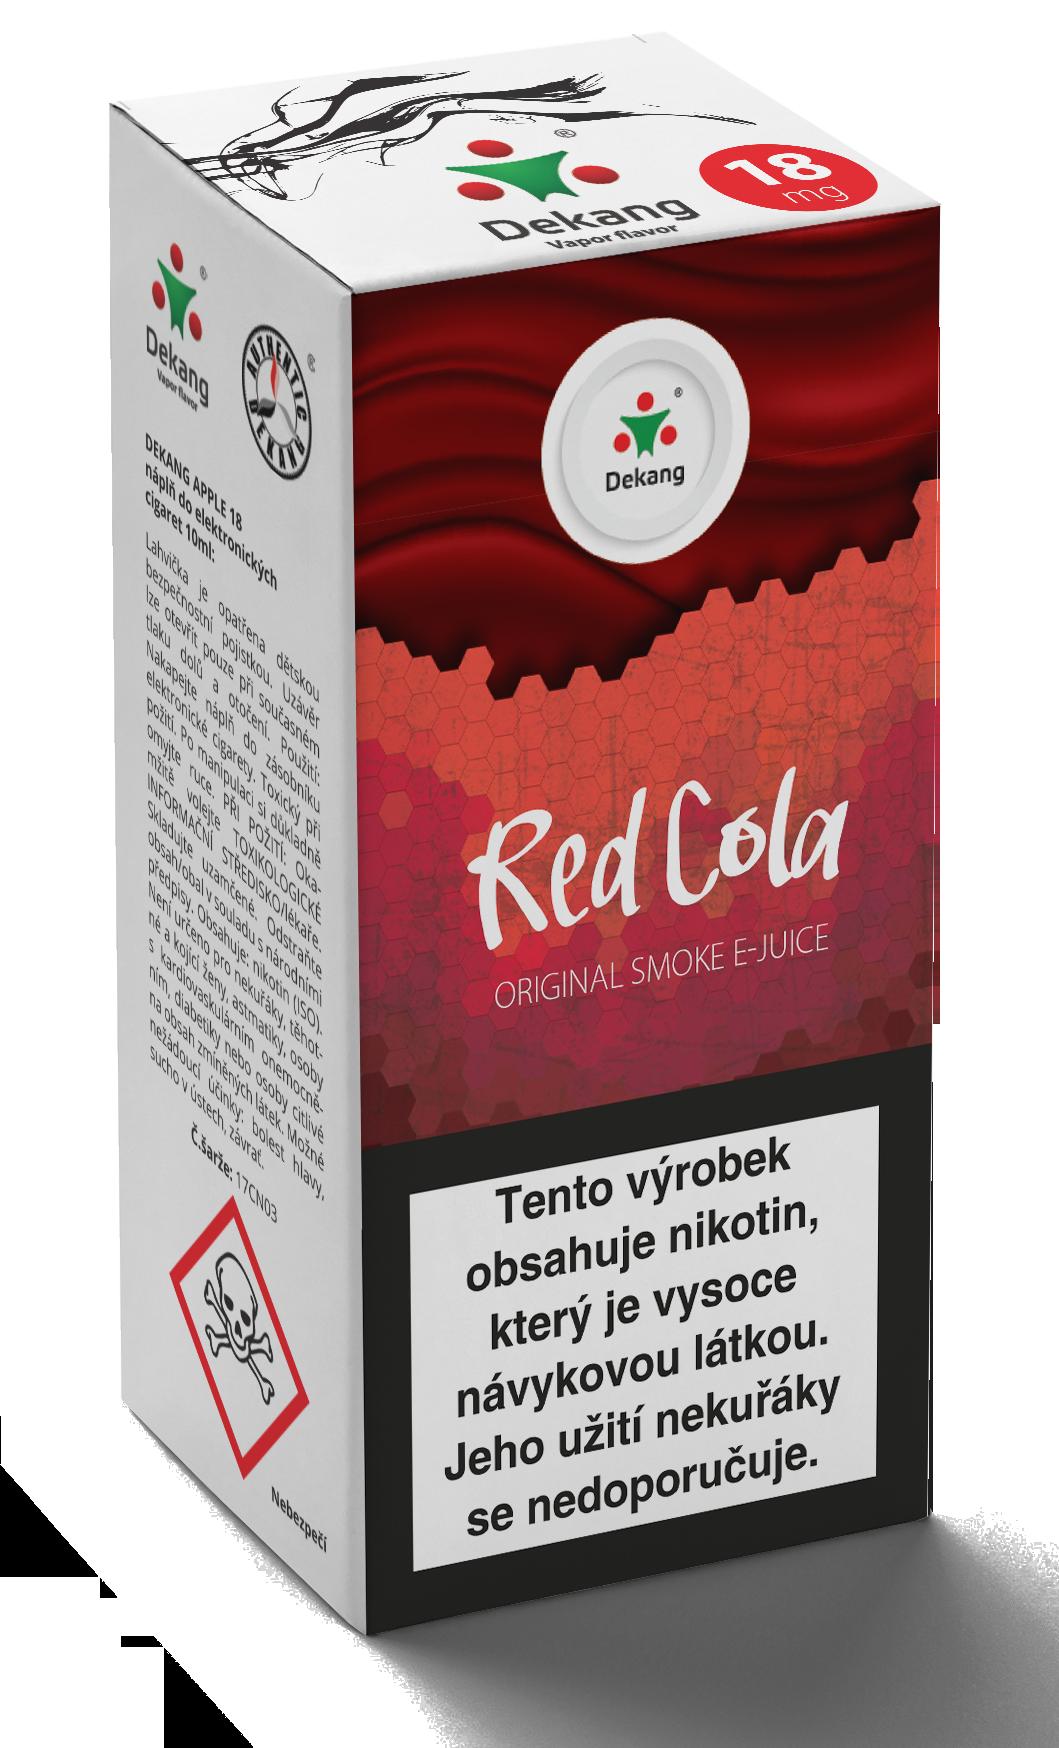 E-liquid Dekang 10ml Red Cola - Kola Množství nikotinu: 0mg